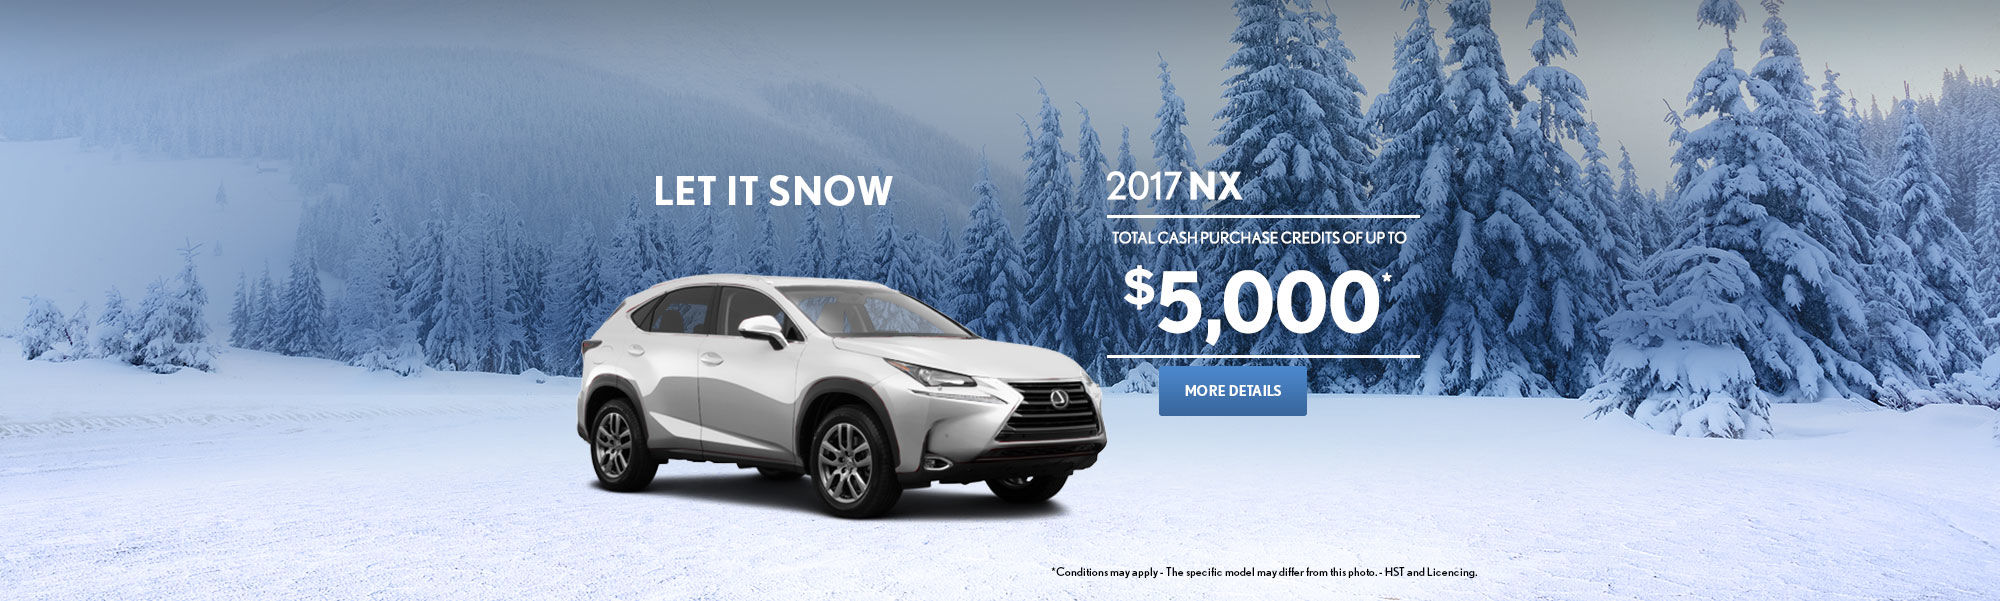 Let it snow - NX